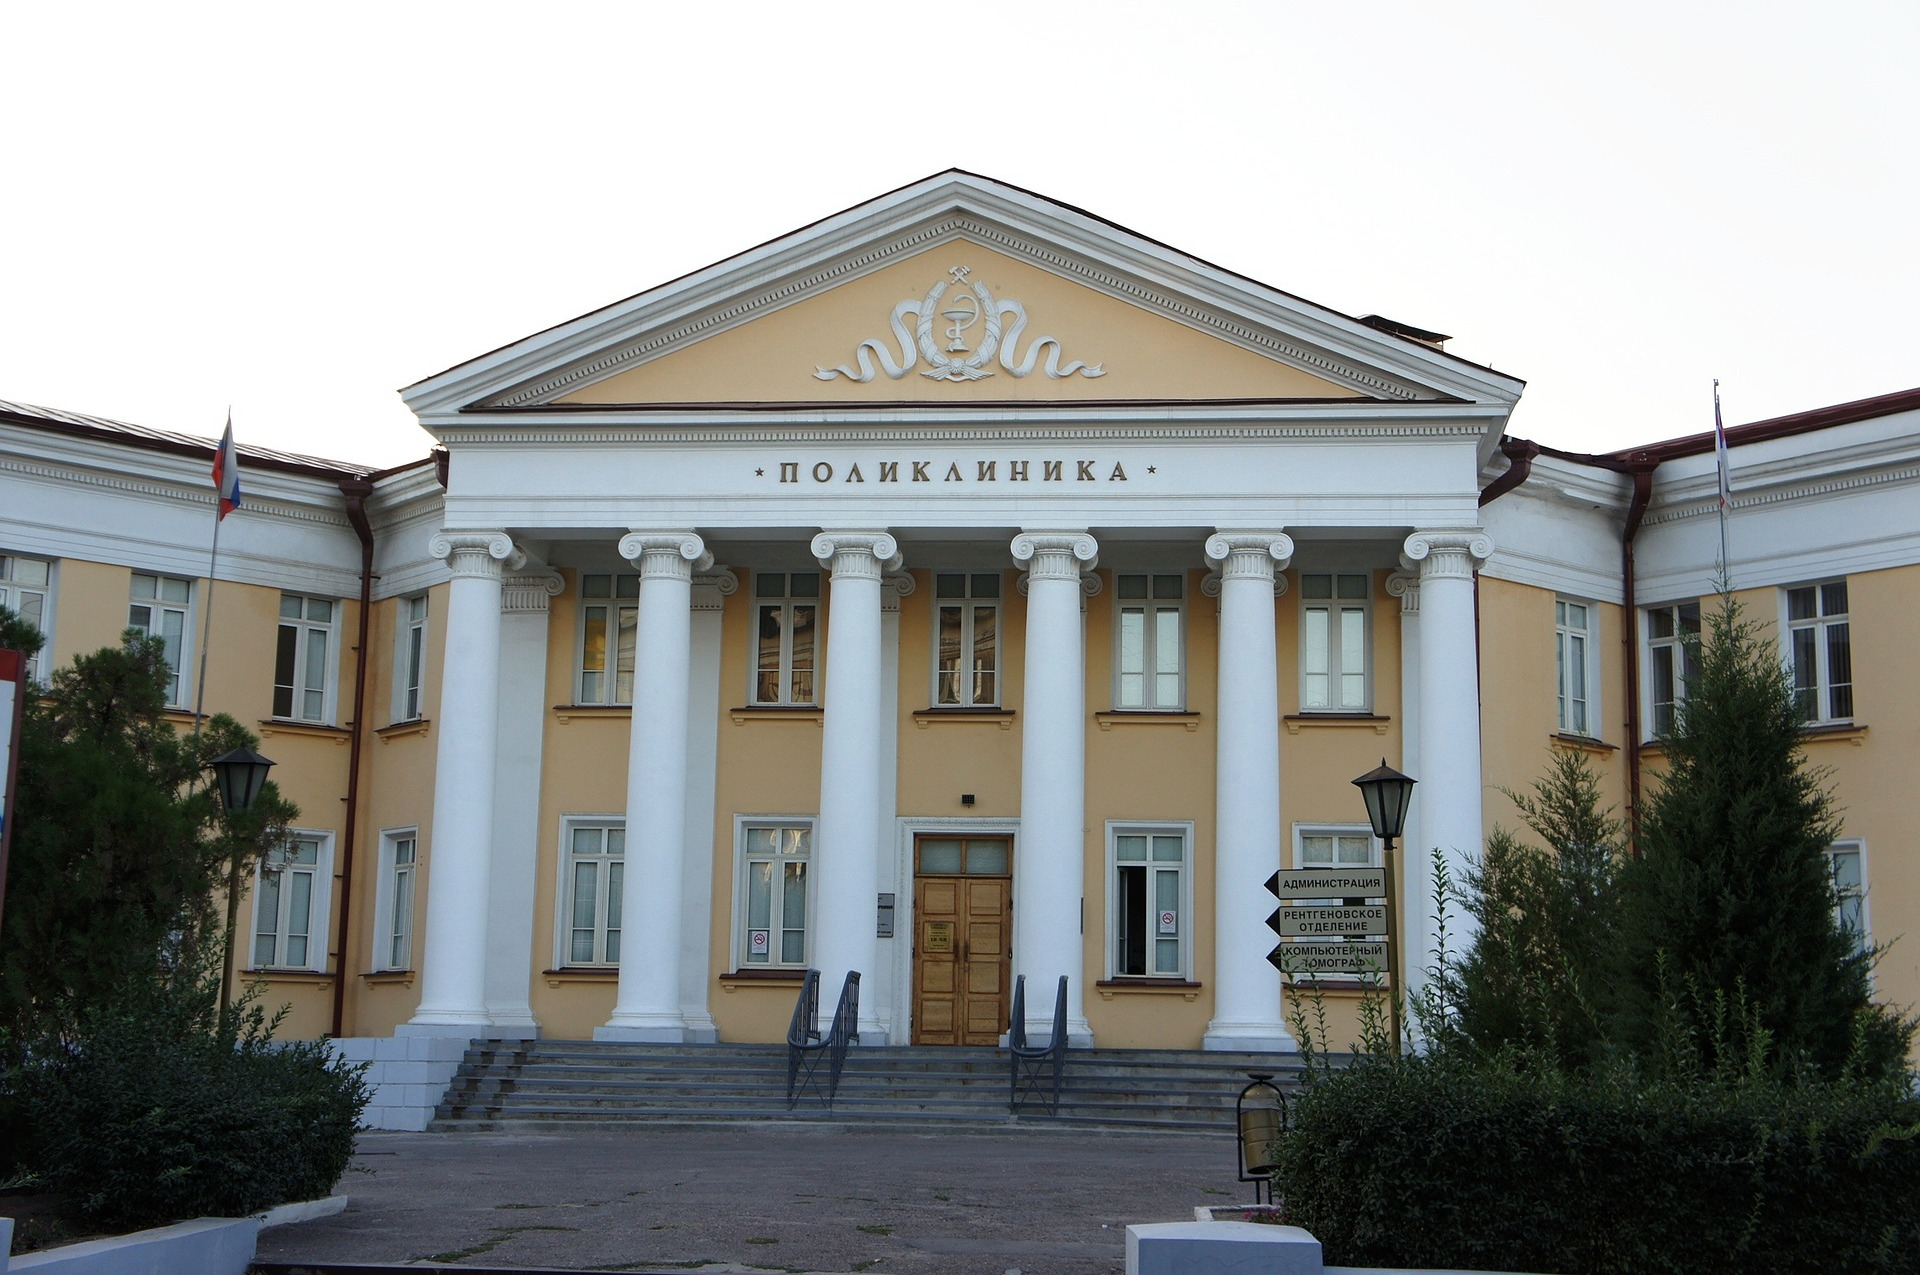 санпин поликлиник